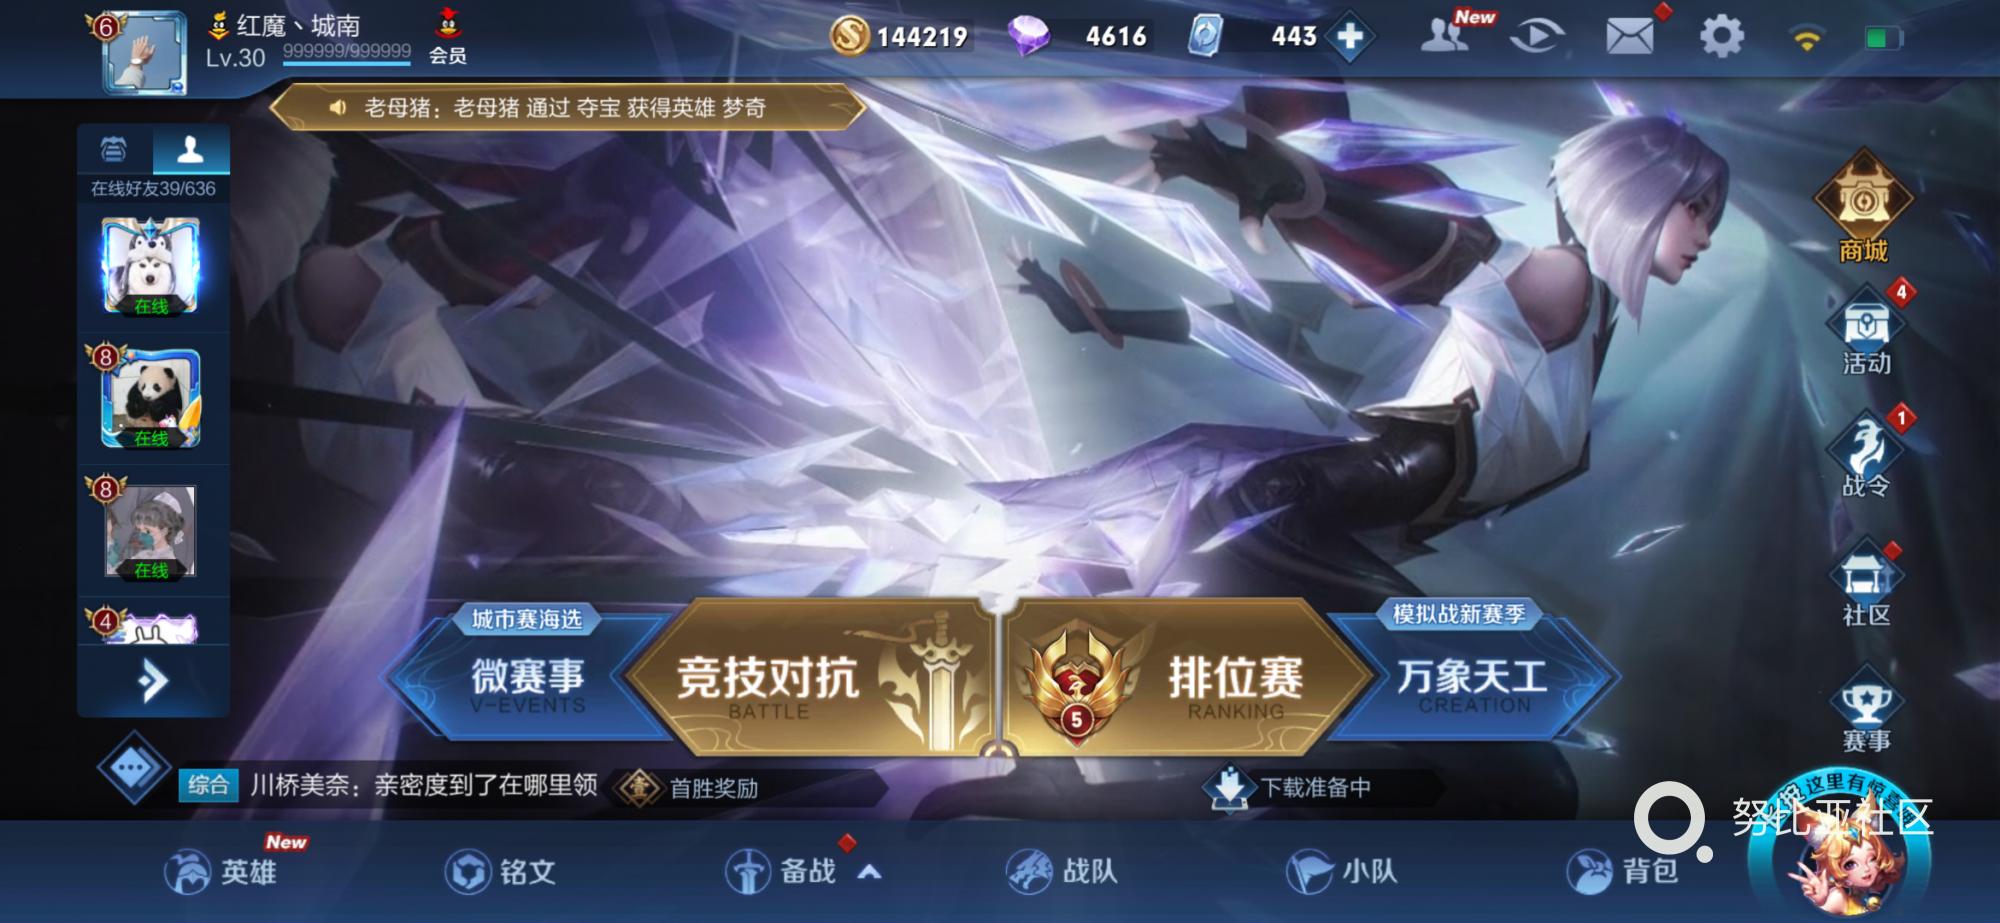 Screenshot_王者荣耀_2020-03-31-11-25-08-046.png